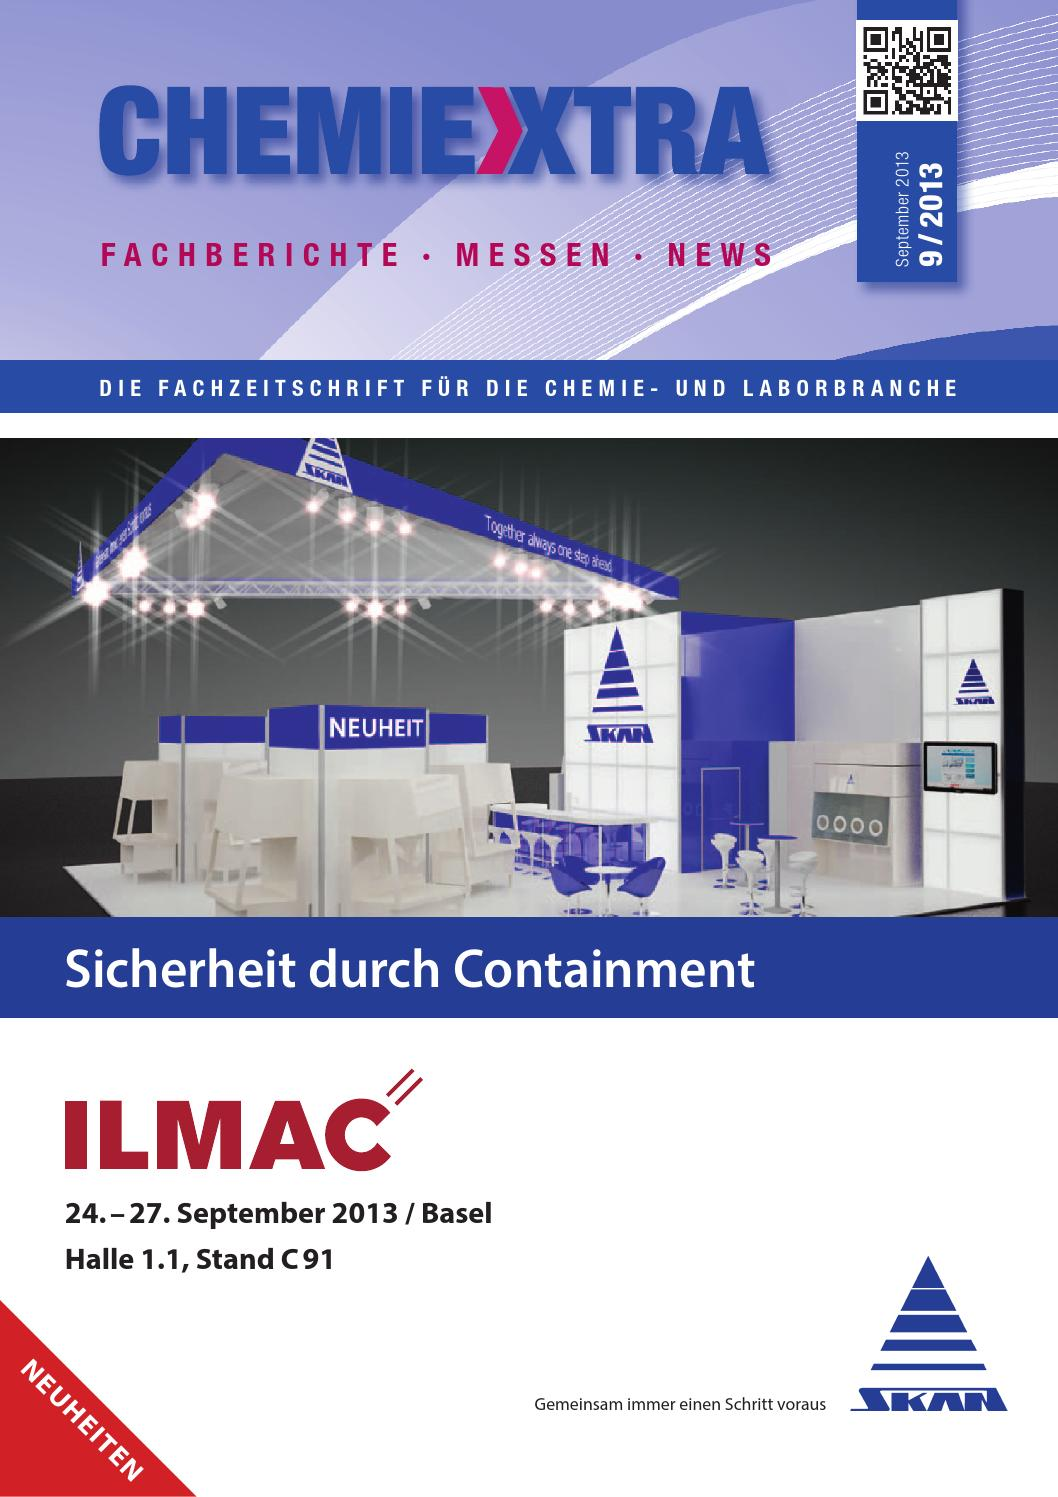 82524 chemiextra broschüre 0913 by SIGWERB GmbH - issuu